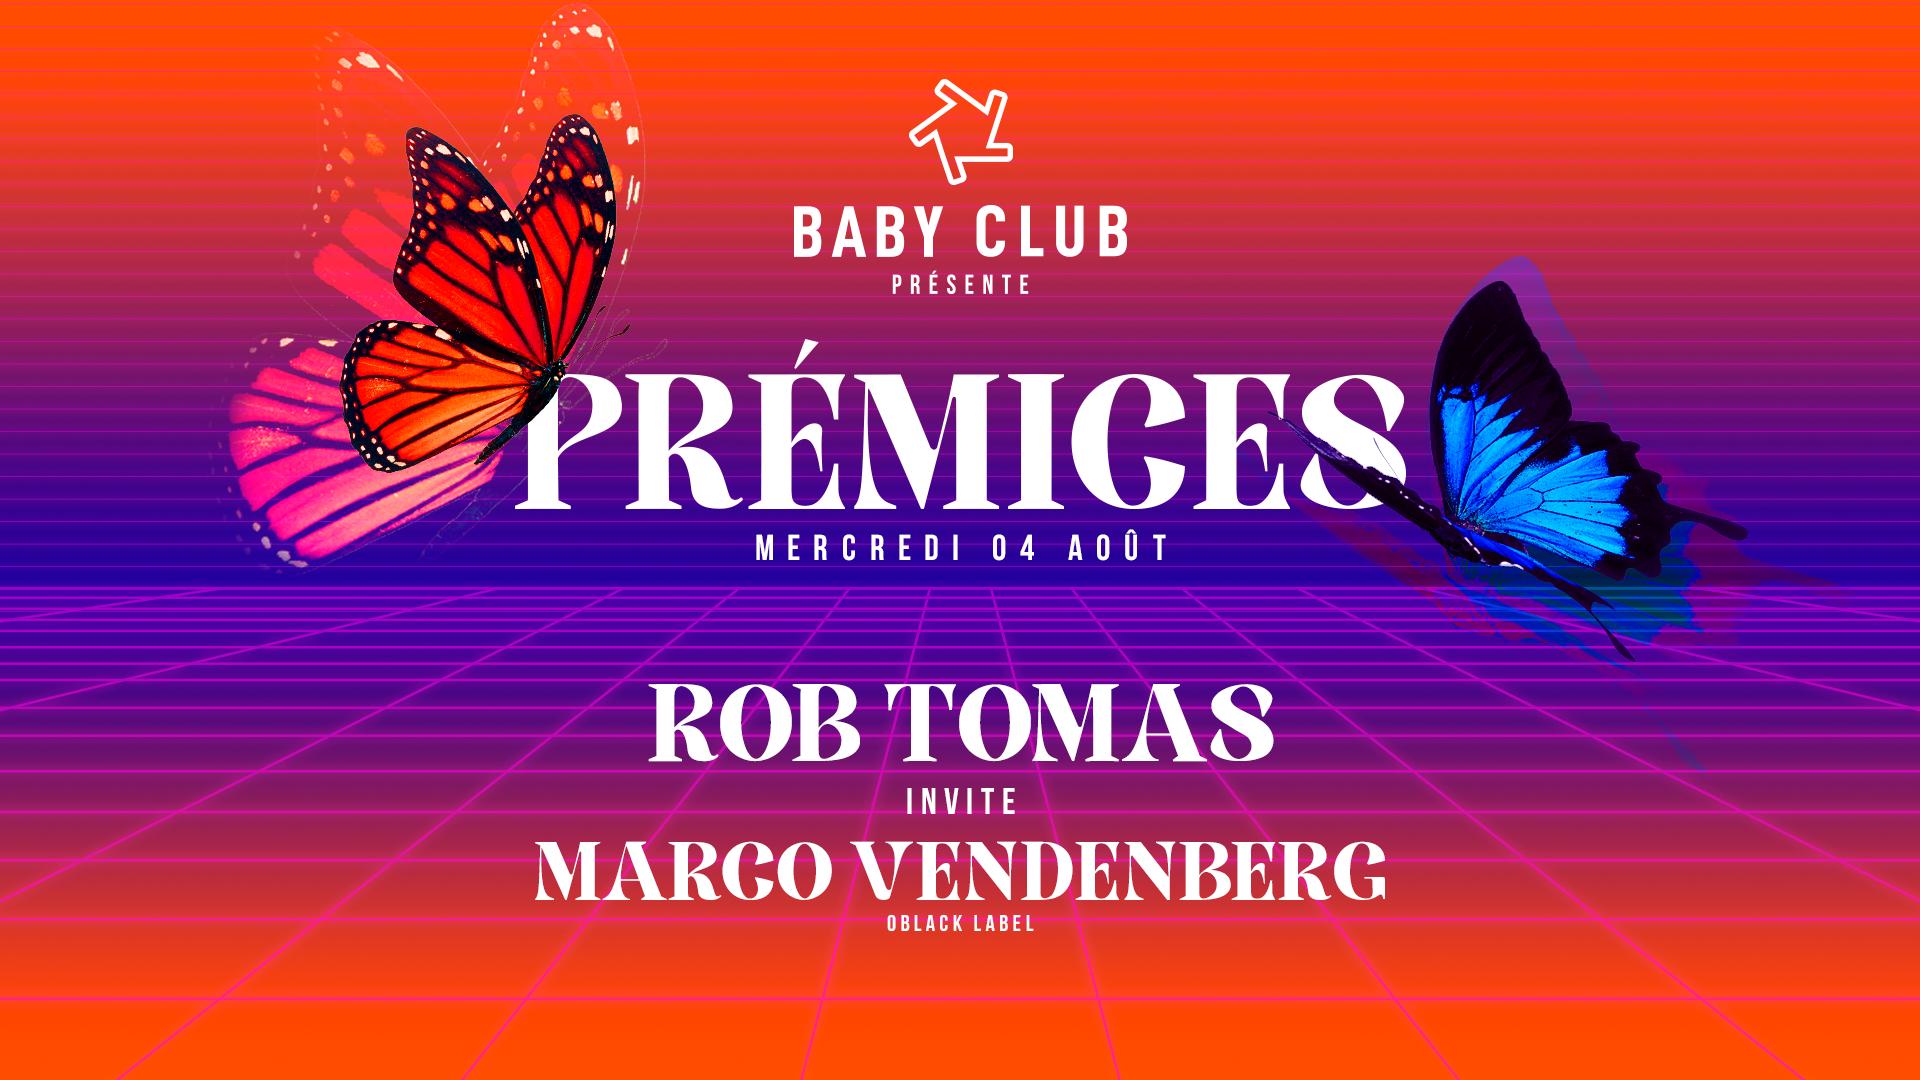 Baby : Prémices - Rob Tomas & Marco Vendenberg (oblack label)